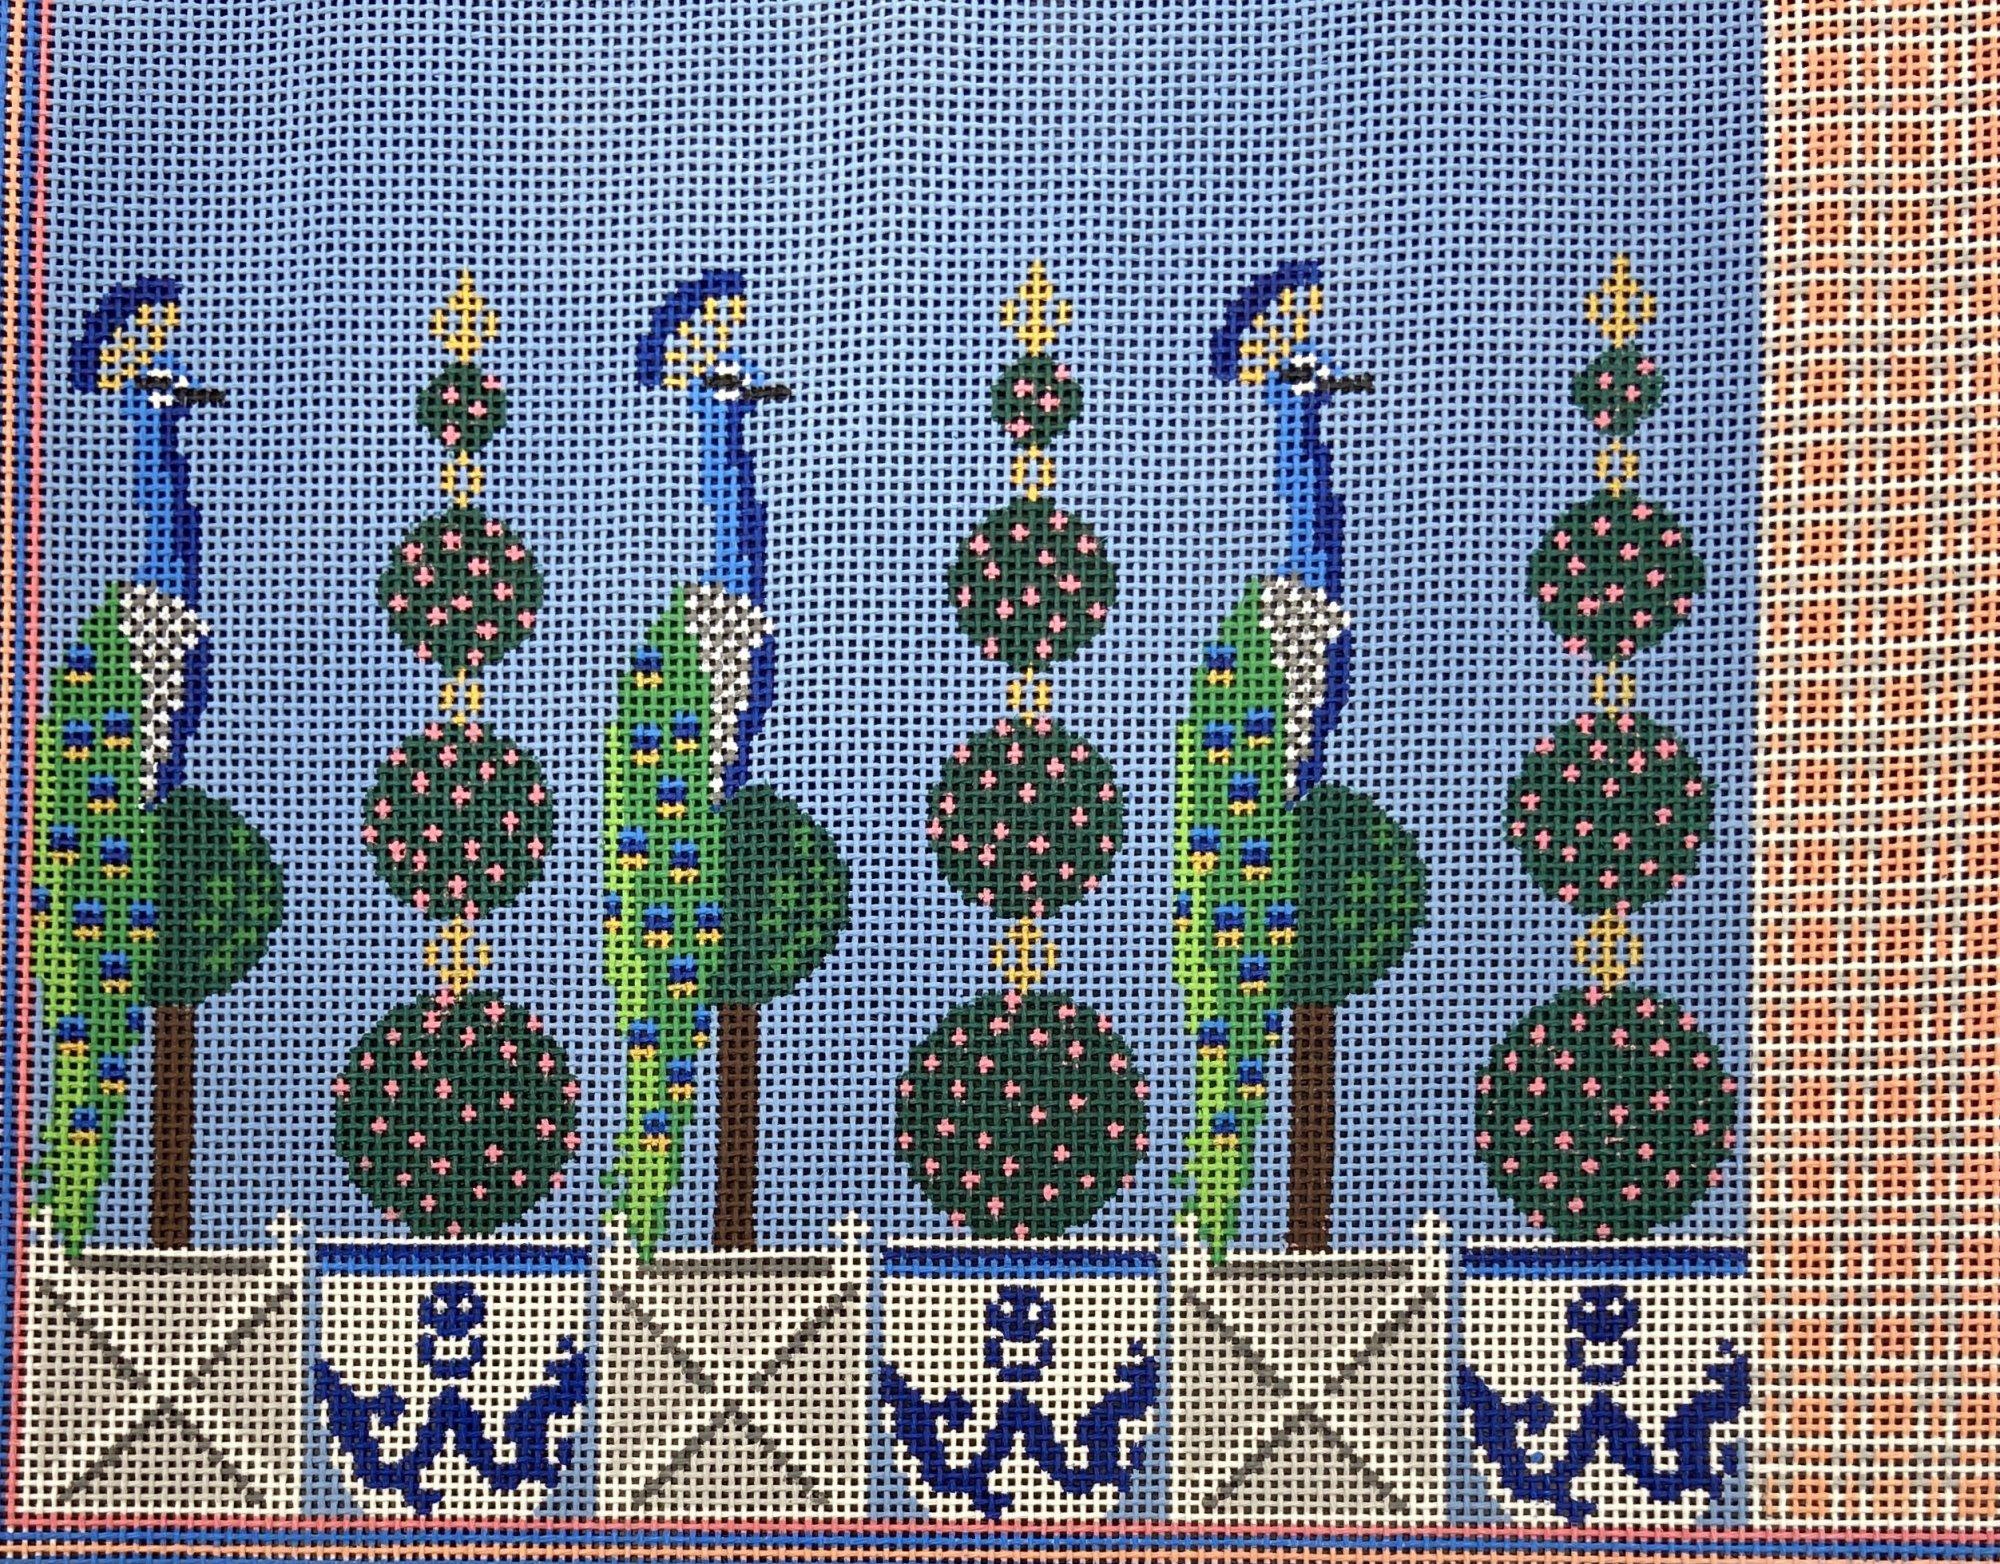 AF99 Peacock Backgammon Game Board Anne Fisher